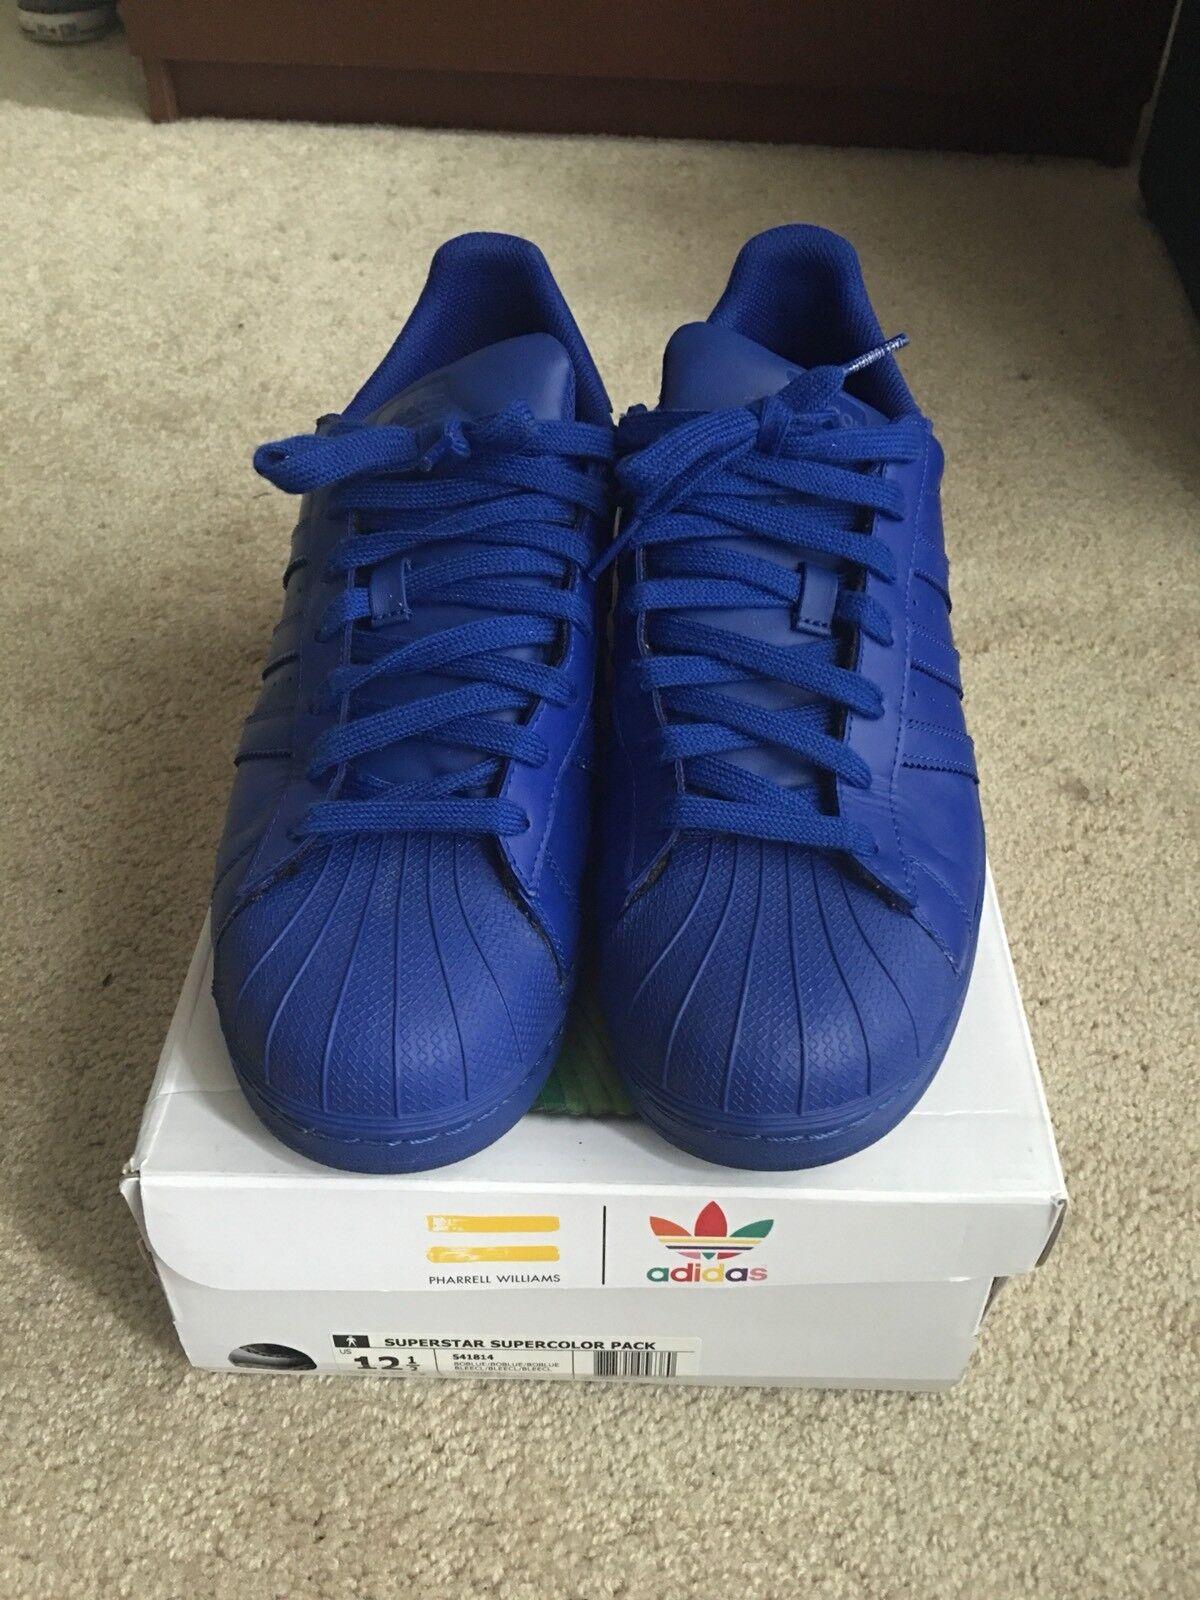 Adidas Pharrell Williams Superstar Supercolor Pack (Royal bluee, S41814) Sz. 12.5